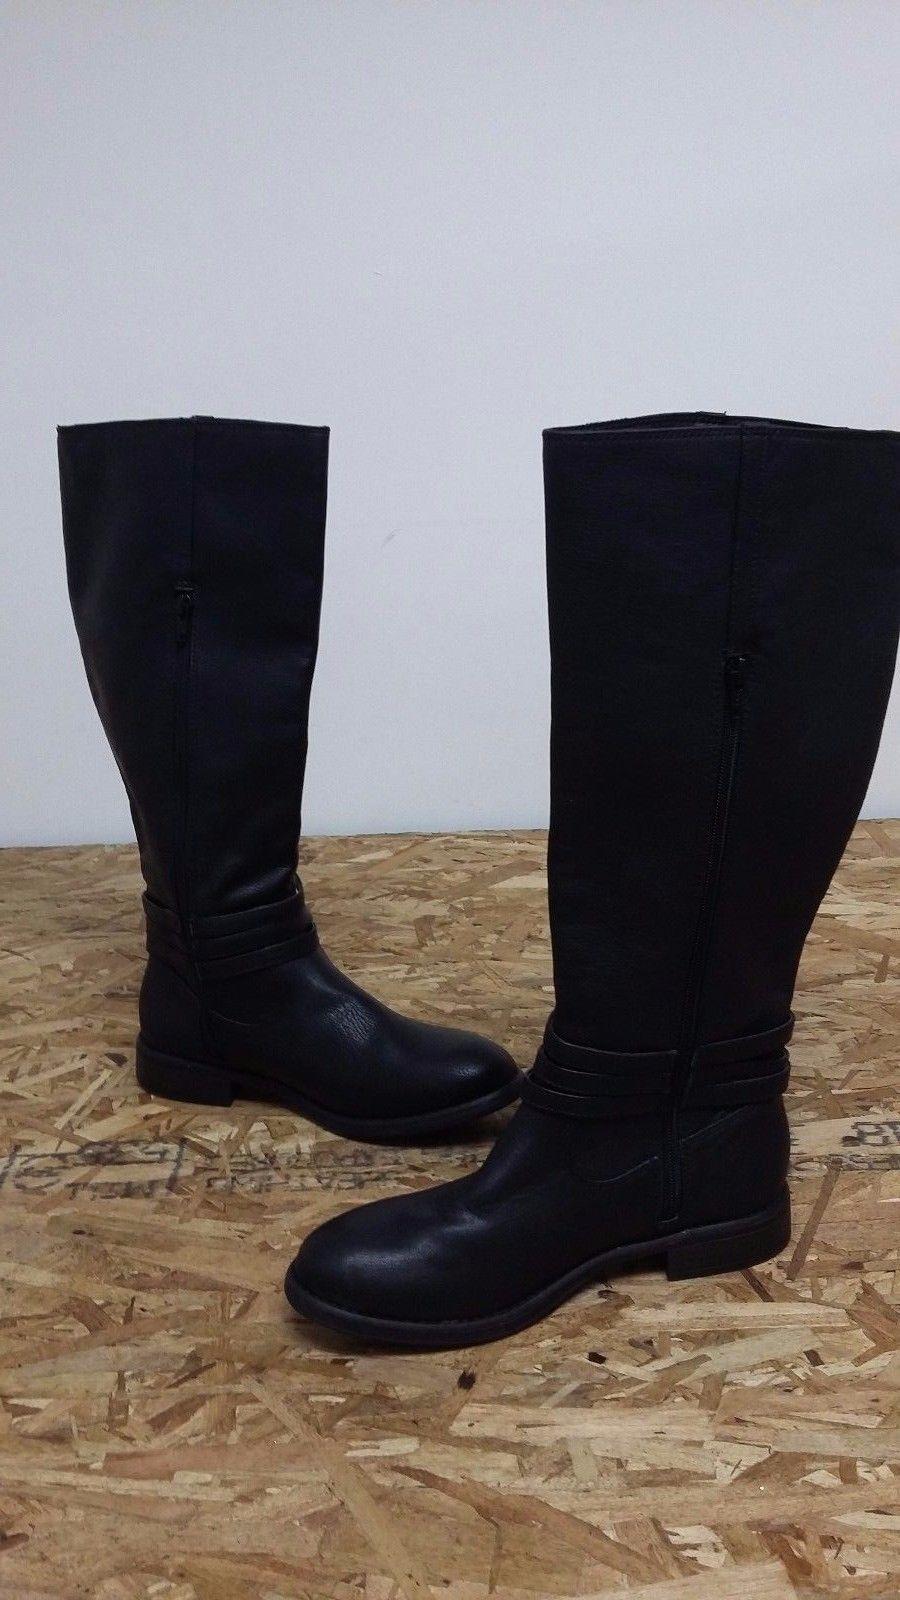 New Womens Lauren Conrad Hunter Fashion Knee High Boots Style 163415 Black 108T